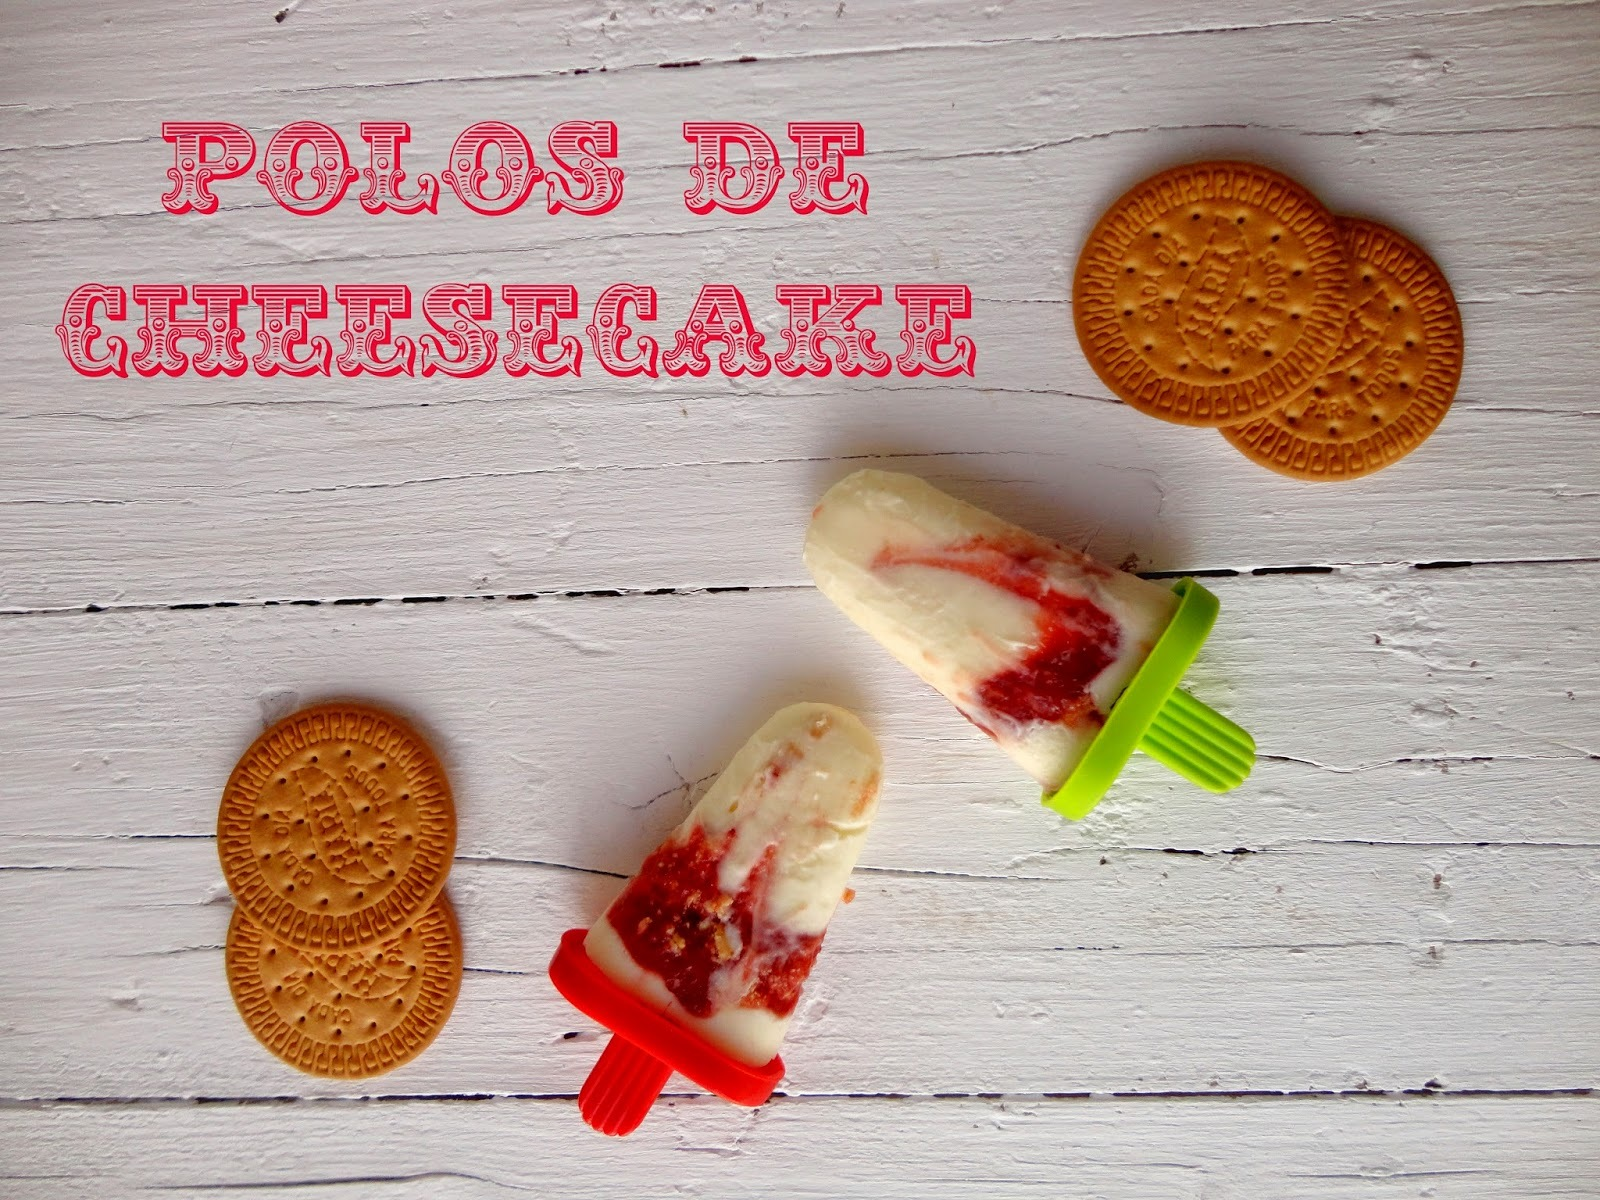 Polos de Cheesecake (Cheesecake popsicles)